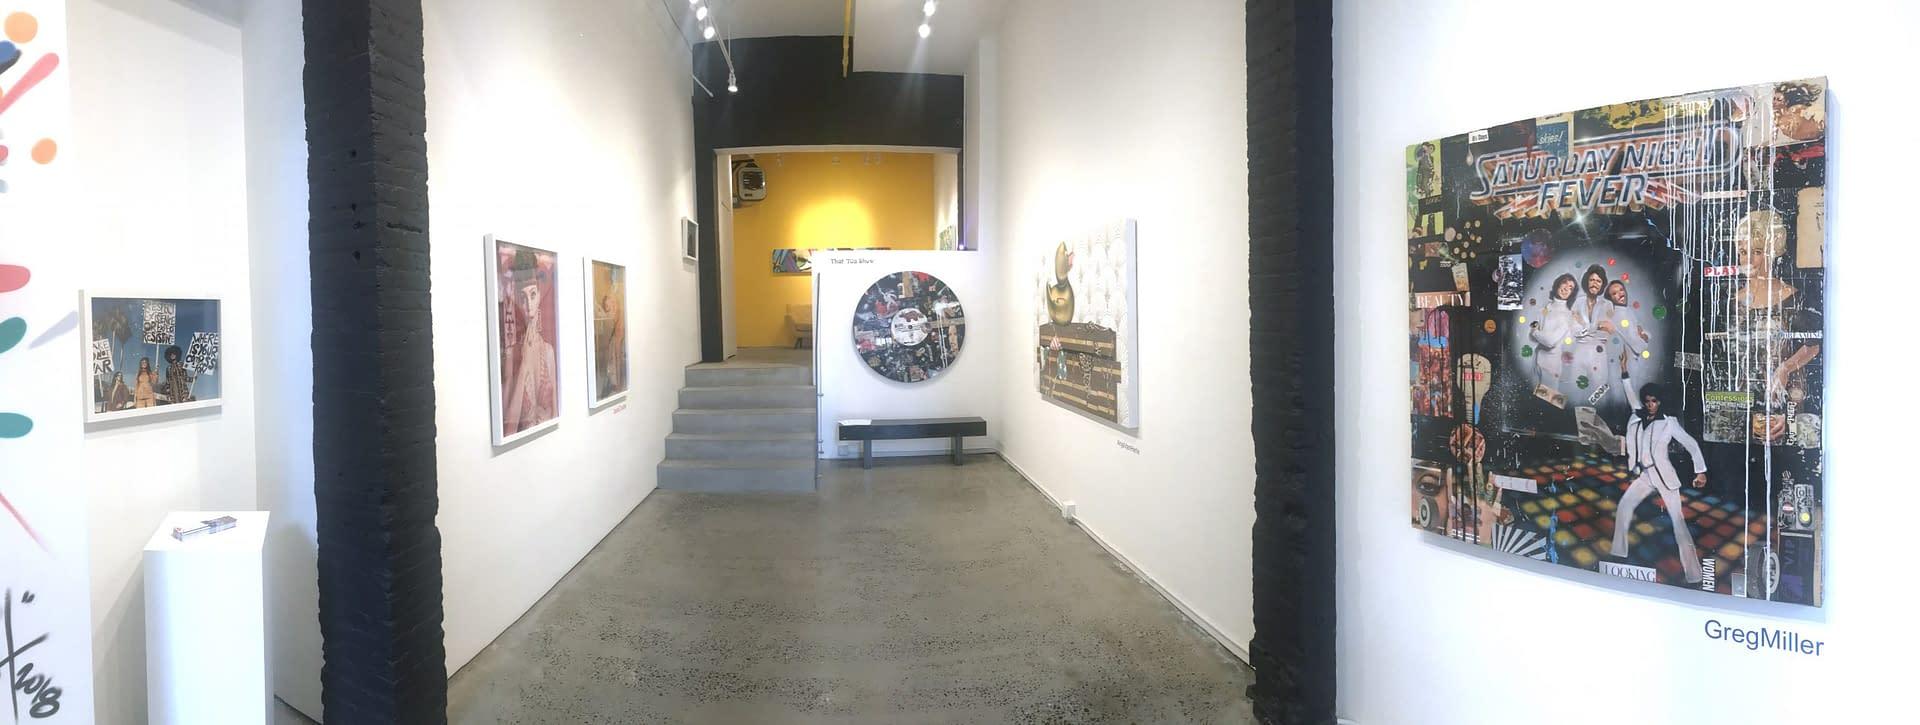 joanne artman gallery new york